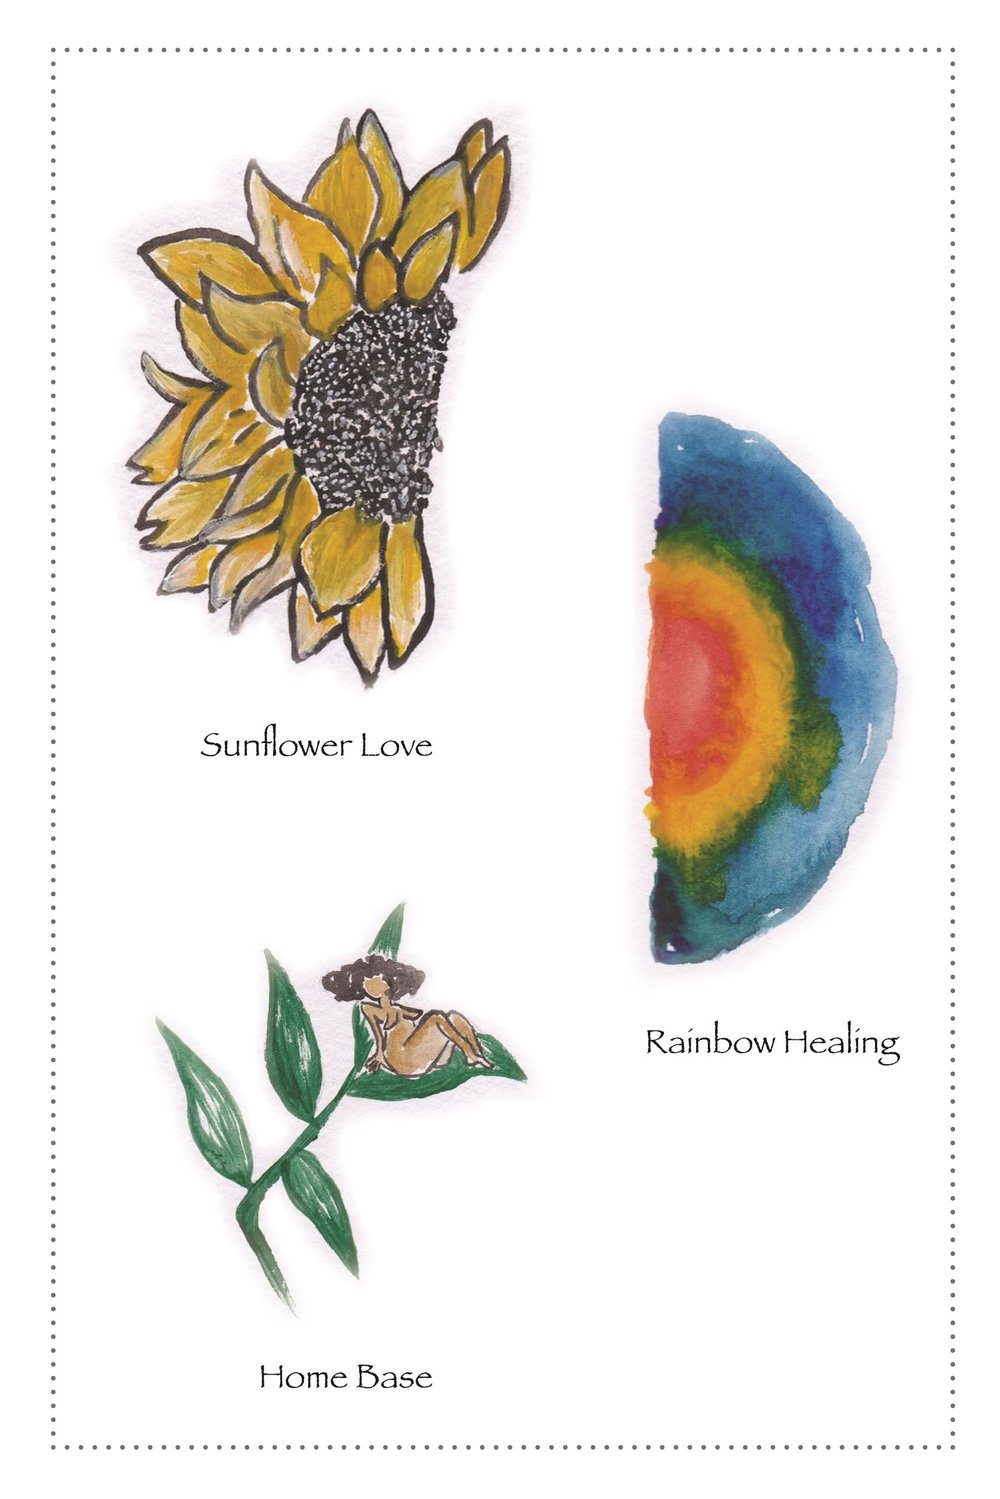 SUNFLOWER LOVE & RAINBOW HEALING & HOME BASE300.jpg